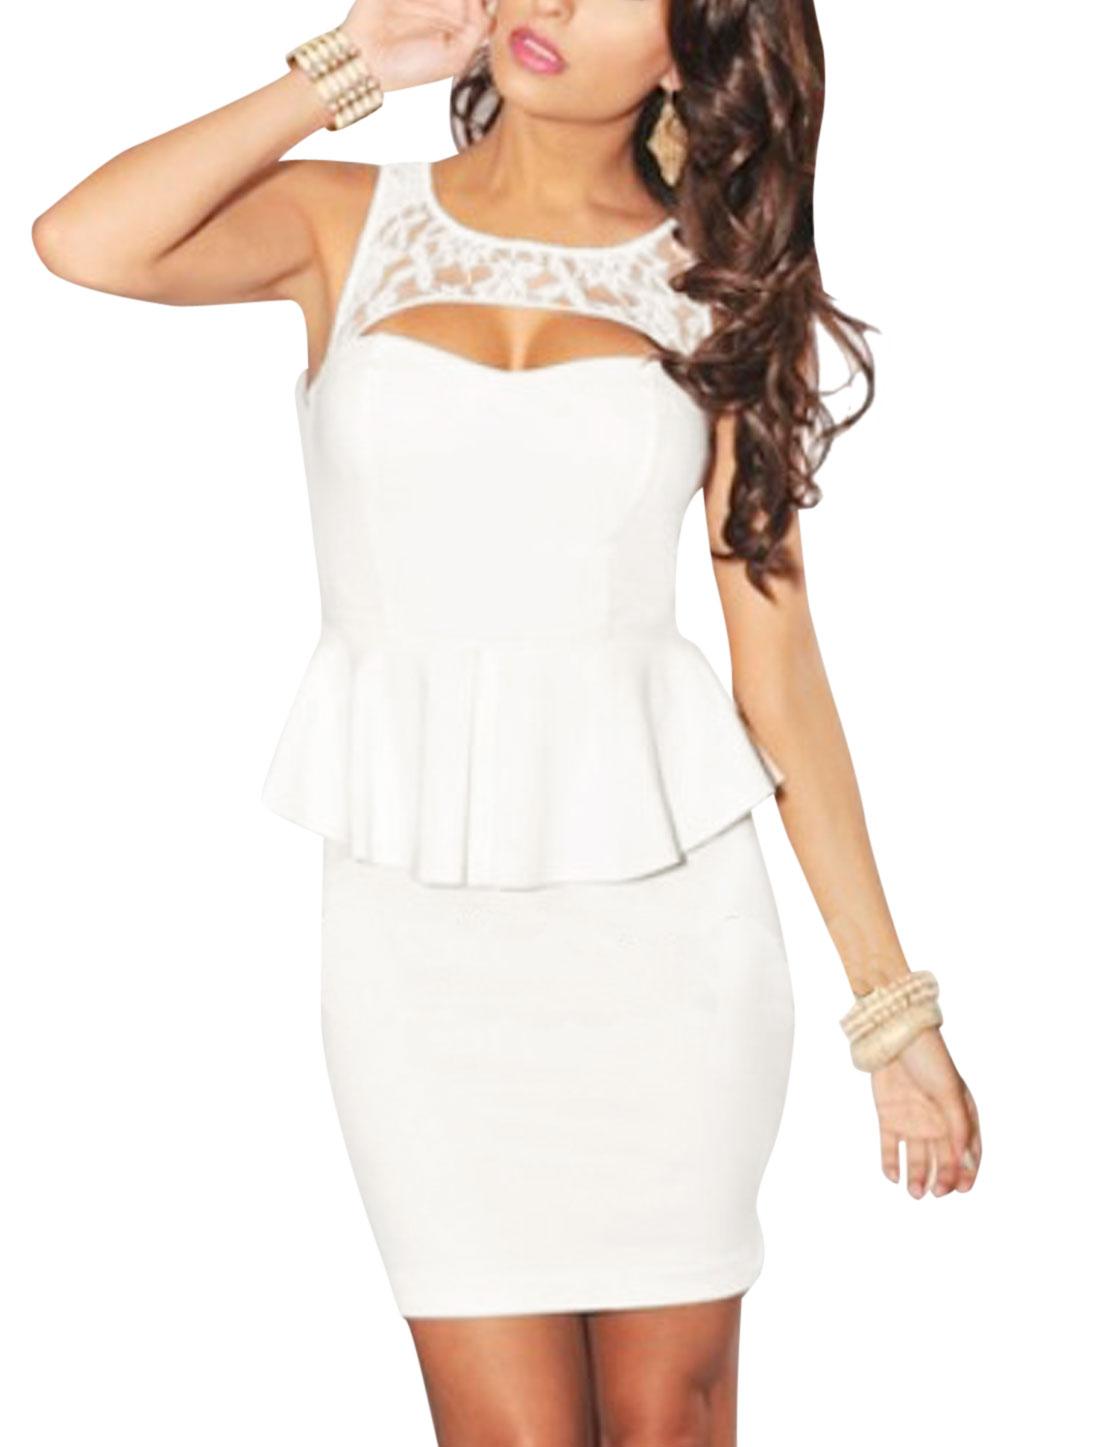 Lady Cut Out Design Padded Bust Sexy Sheath Dress White XS